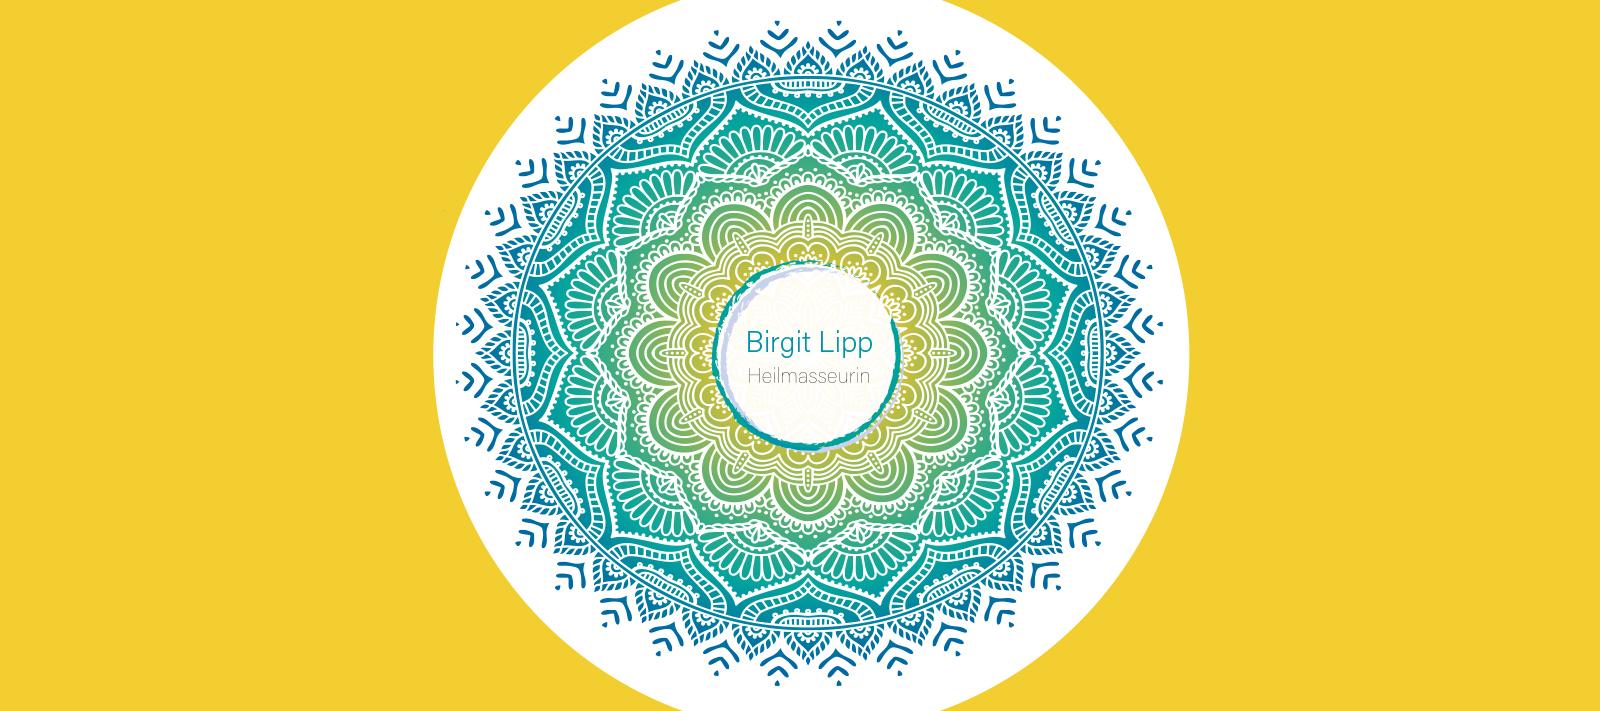 Kontakt Birgit Lipp Heilmassage